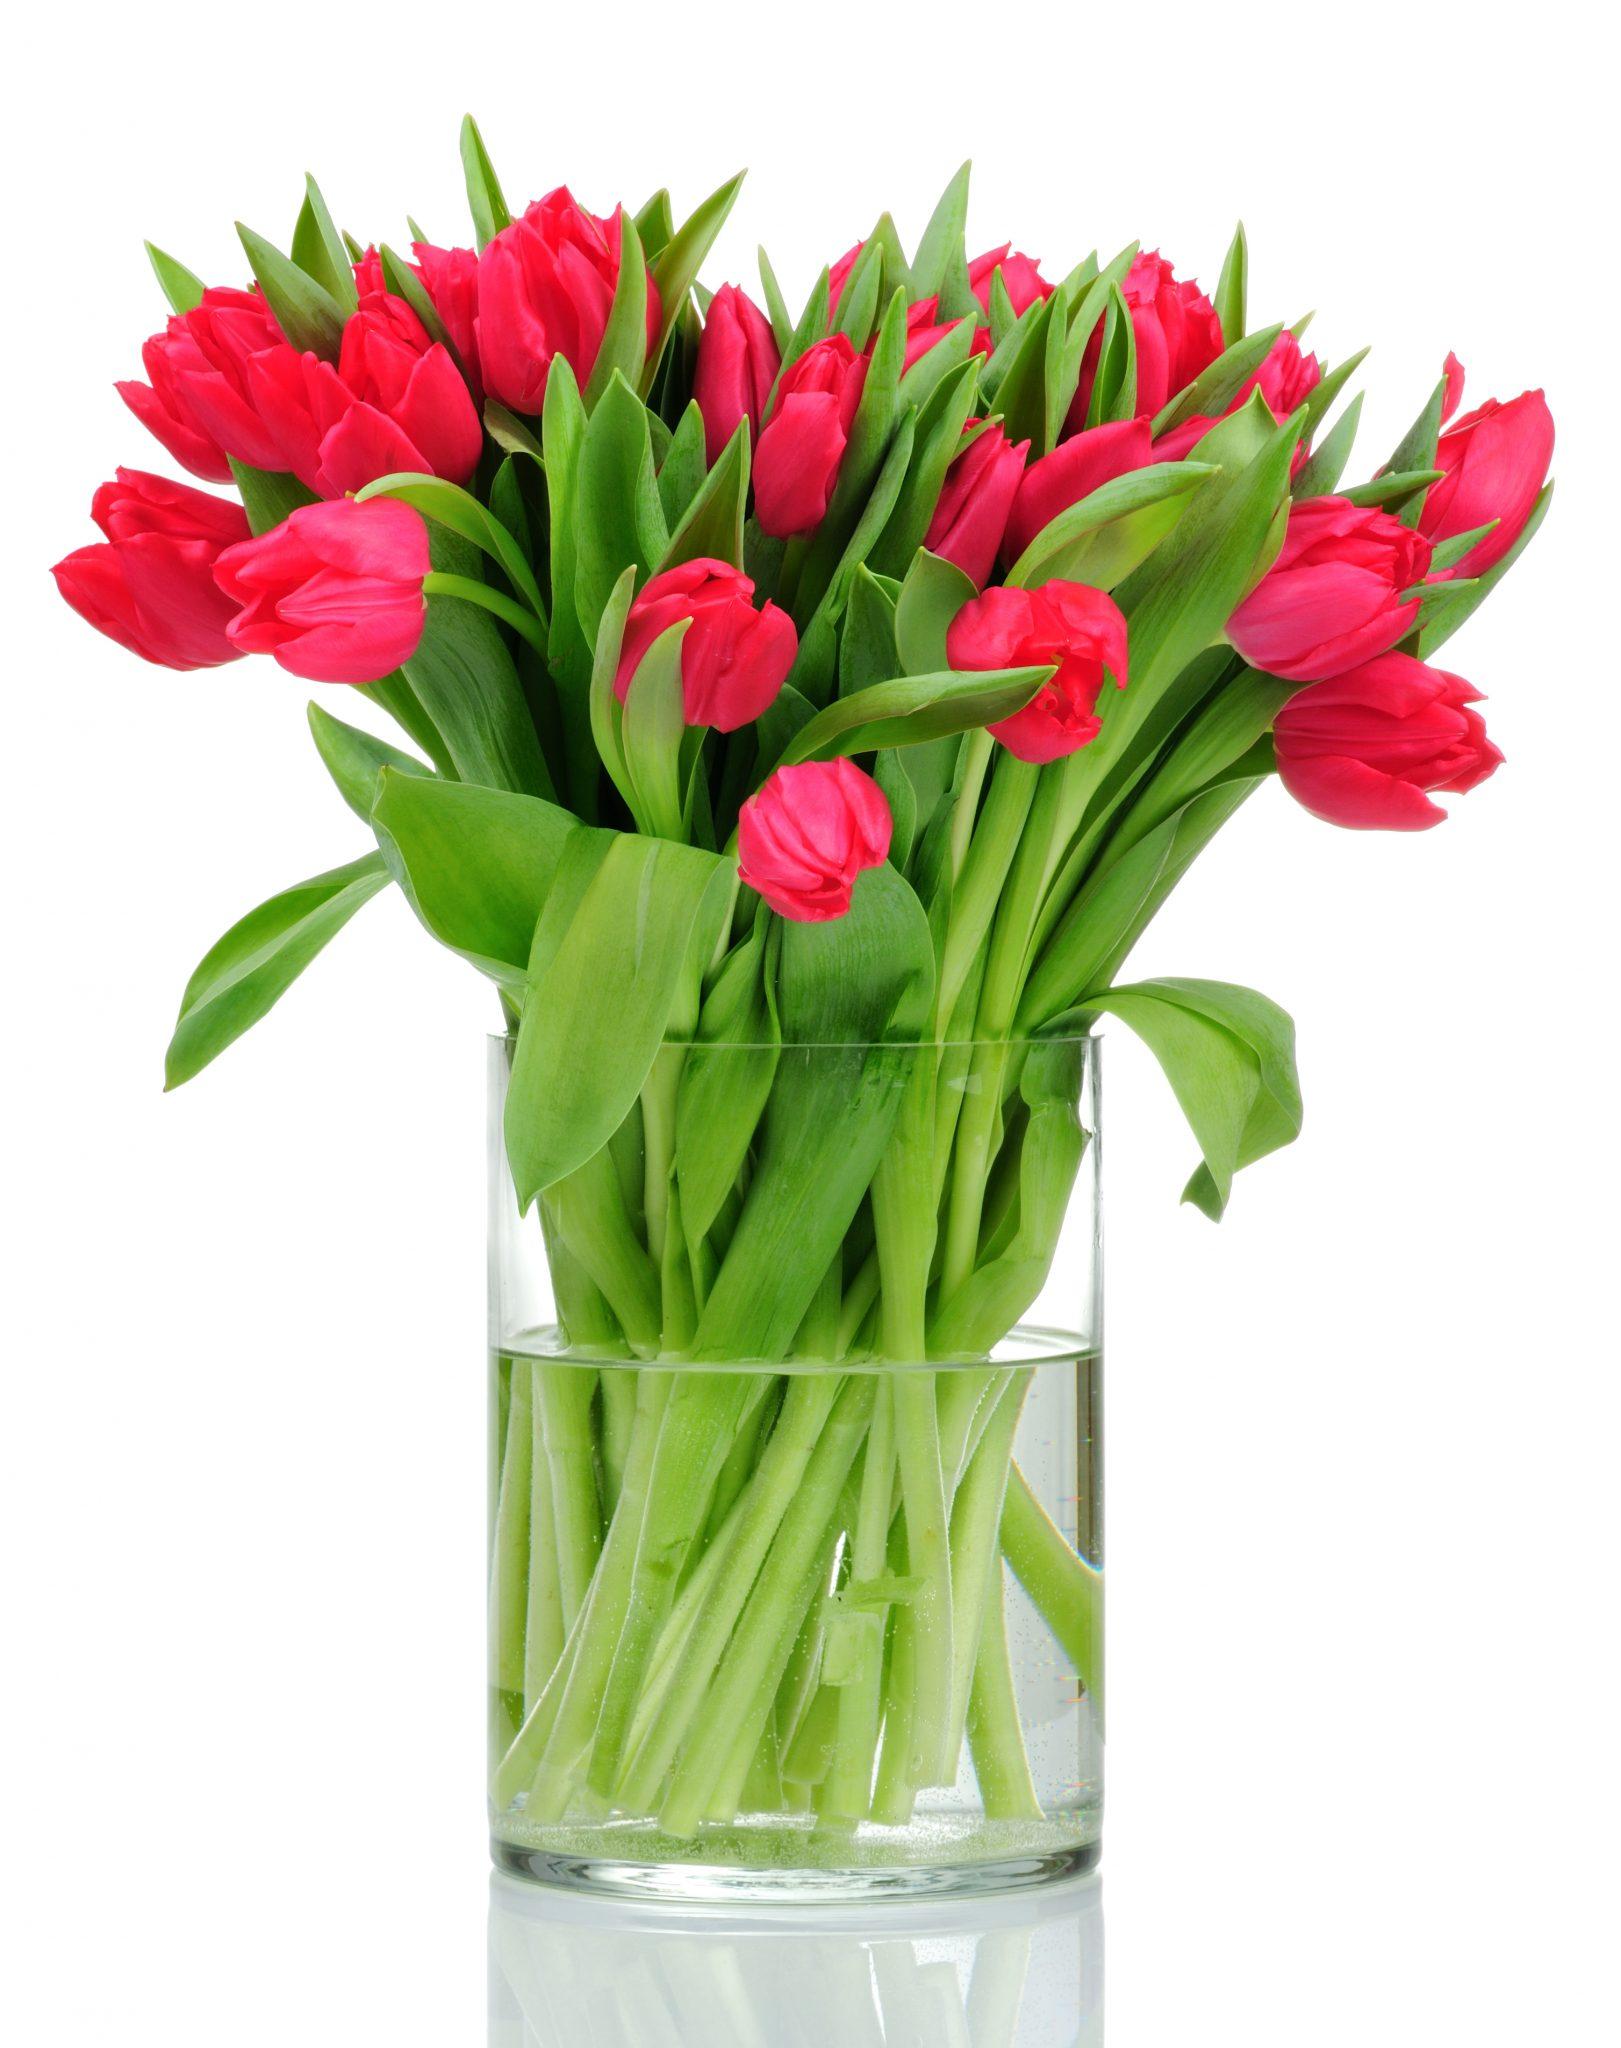 Tulpen Op Vaas.Rode Tulpen In Vaas Flowers Insight